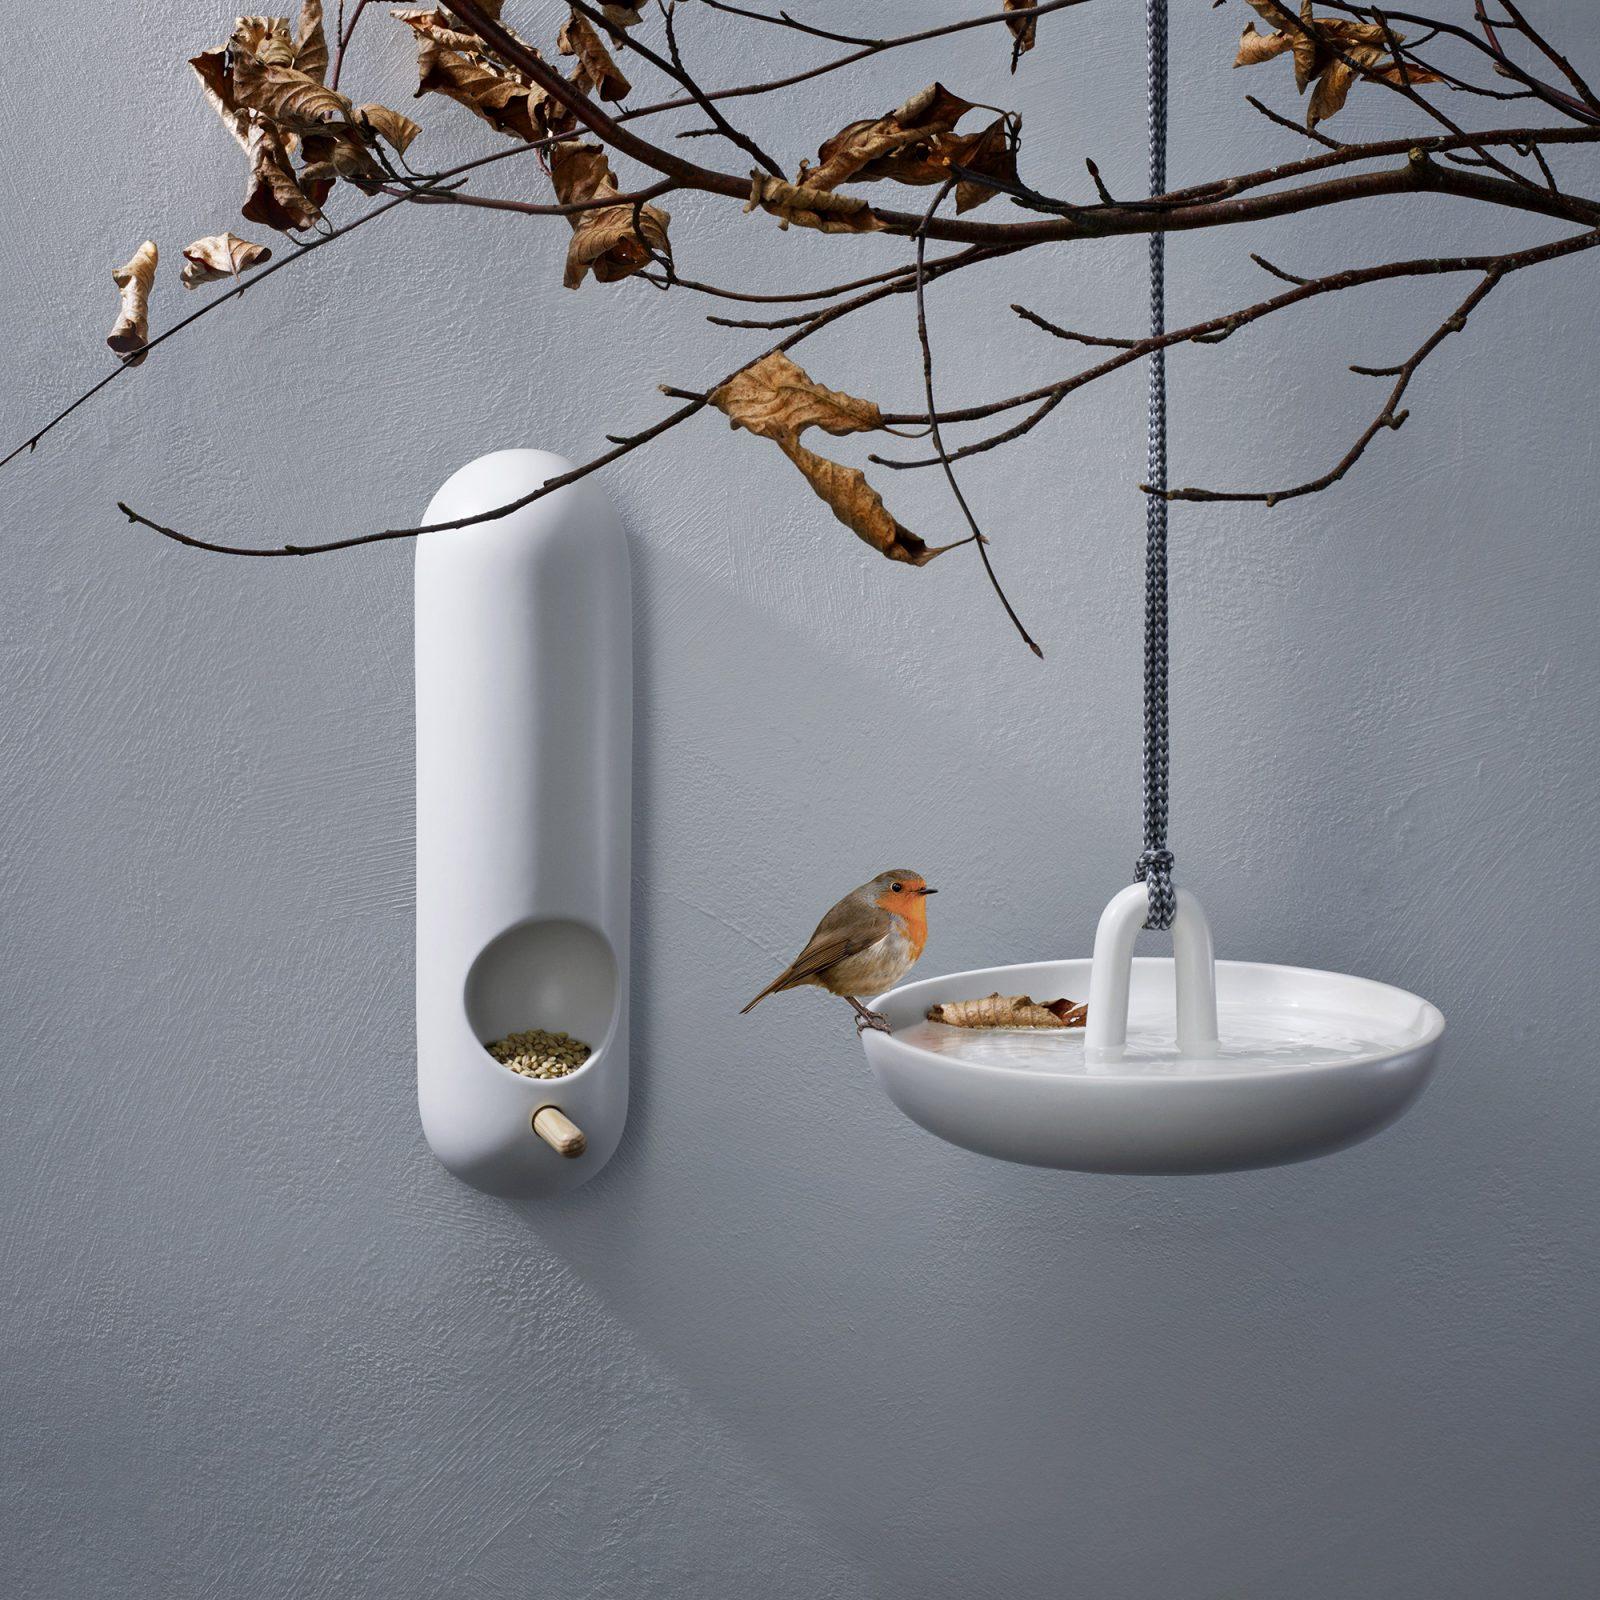 wall-mounted-bird-feeder-tube-5